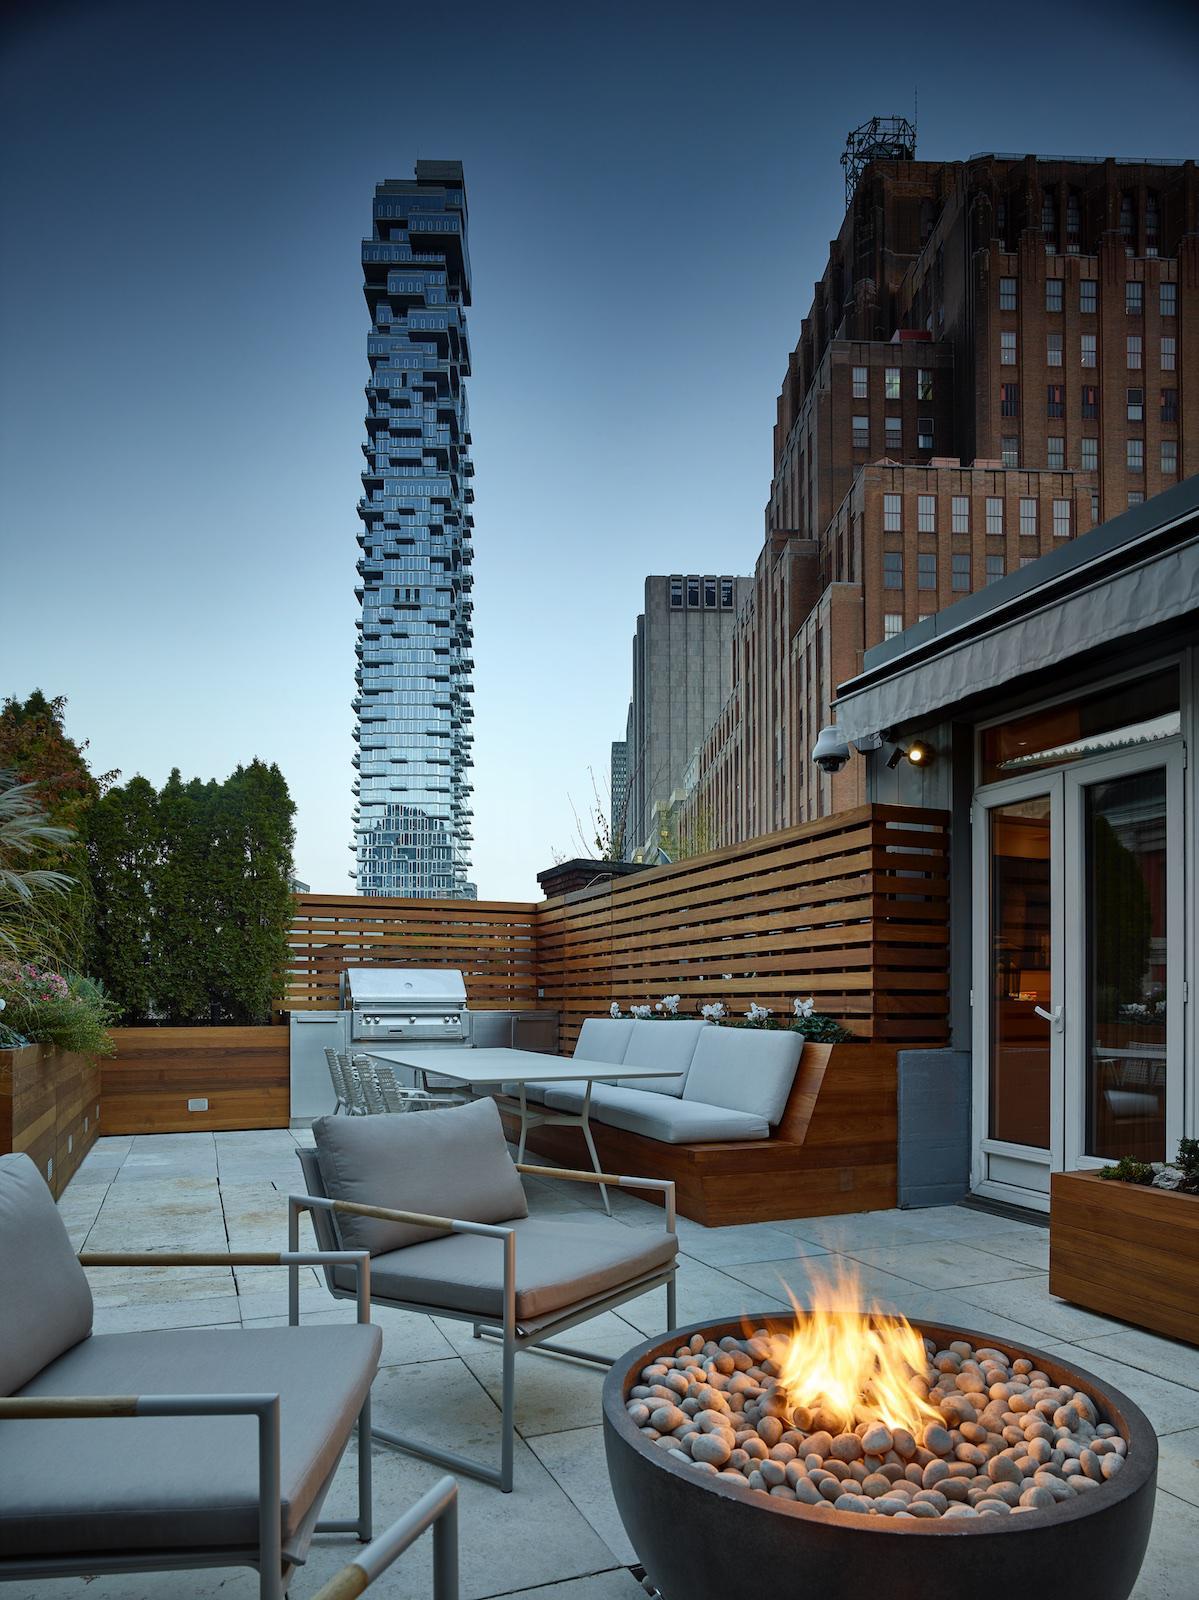 Schiller_TribecaRooftop-11-1 strategic design consultancy